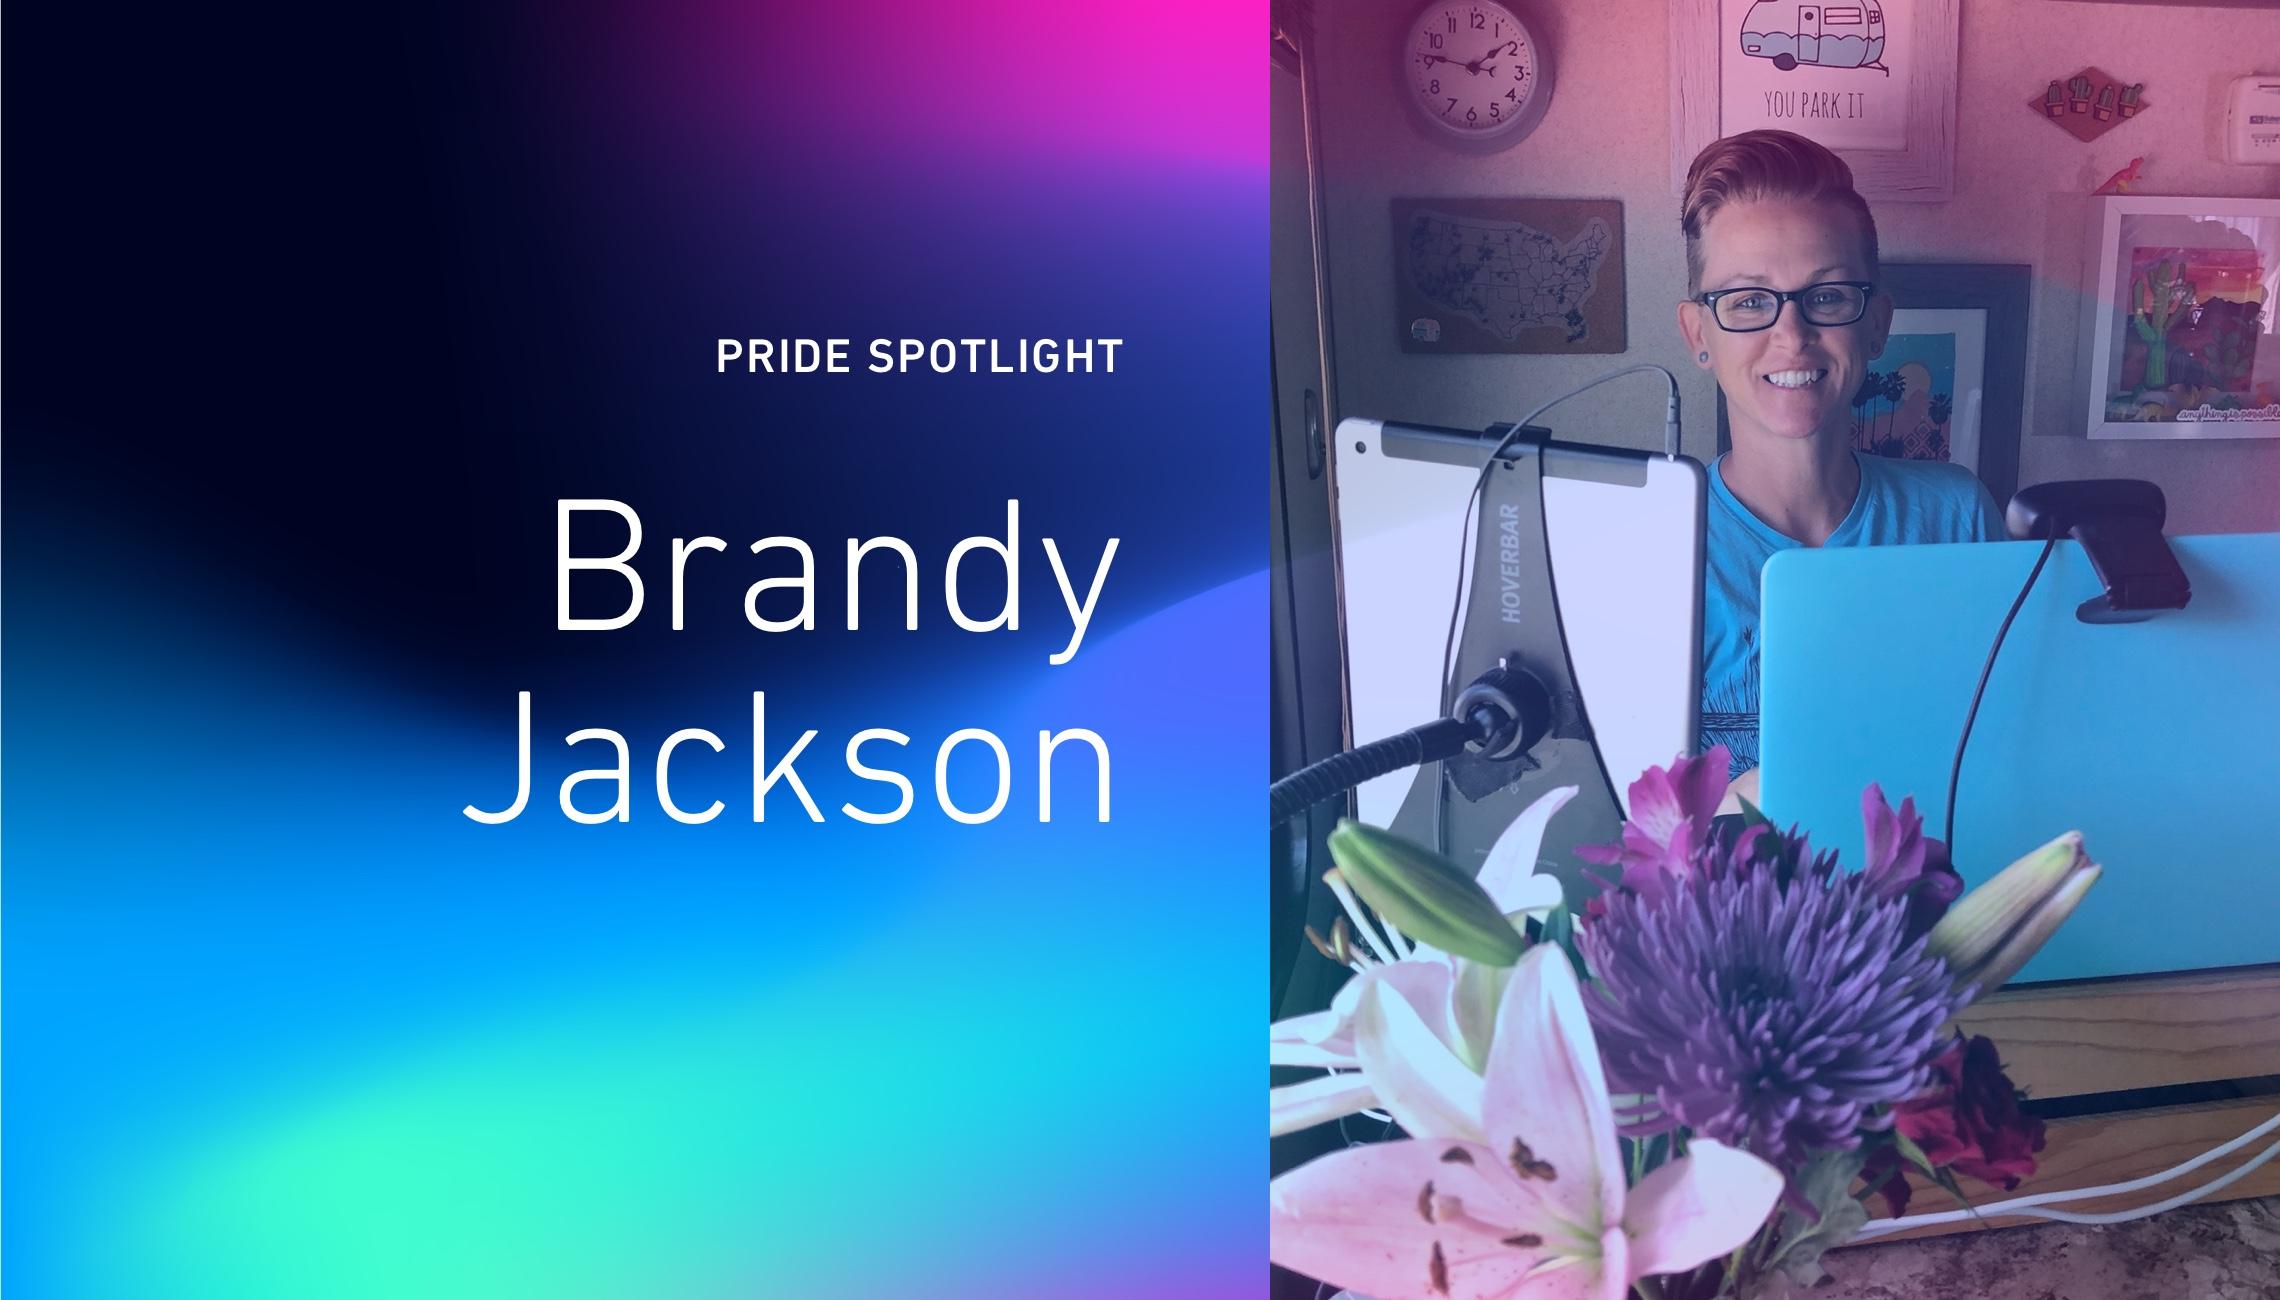 Pride Spotlight: Brandy Jackson